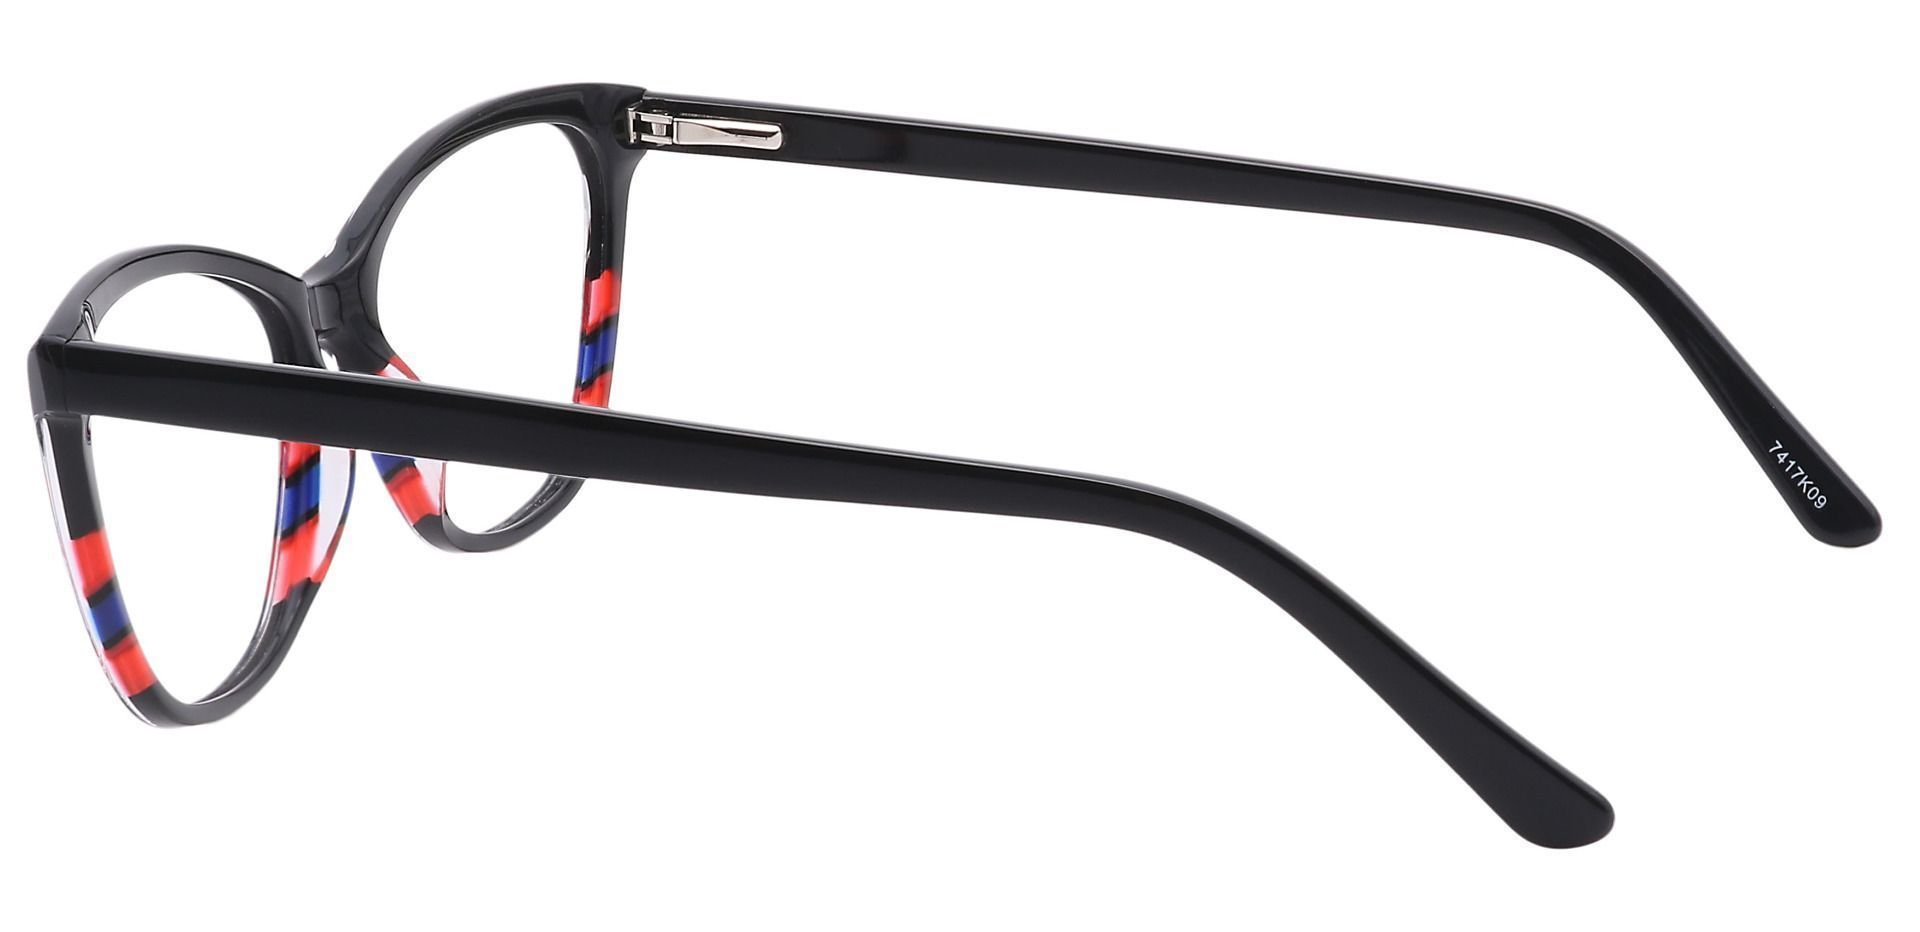 Pixie Cat-Eye Prescription Glasses - Black